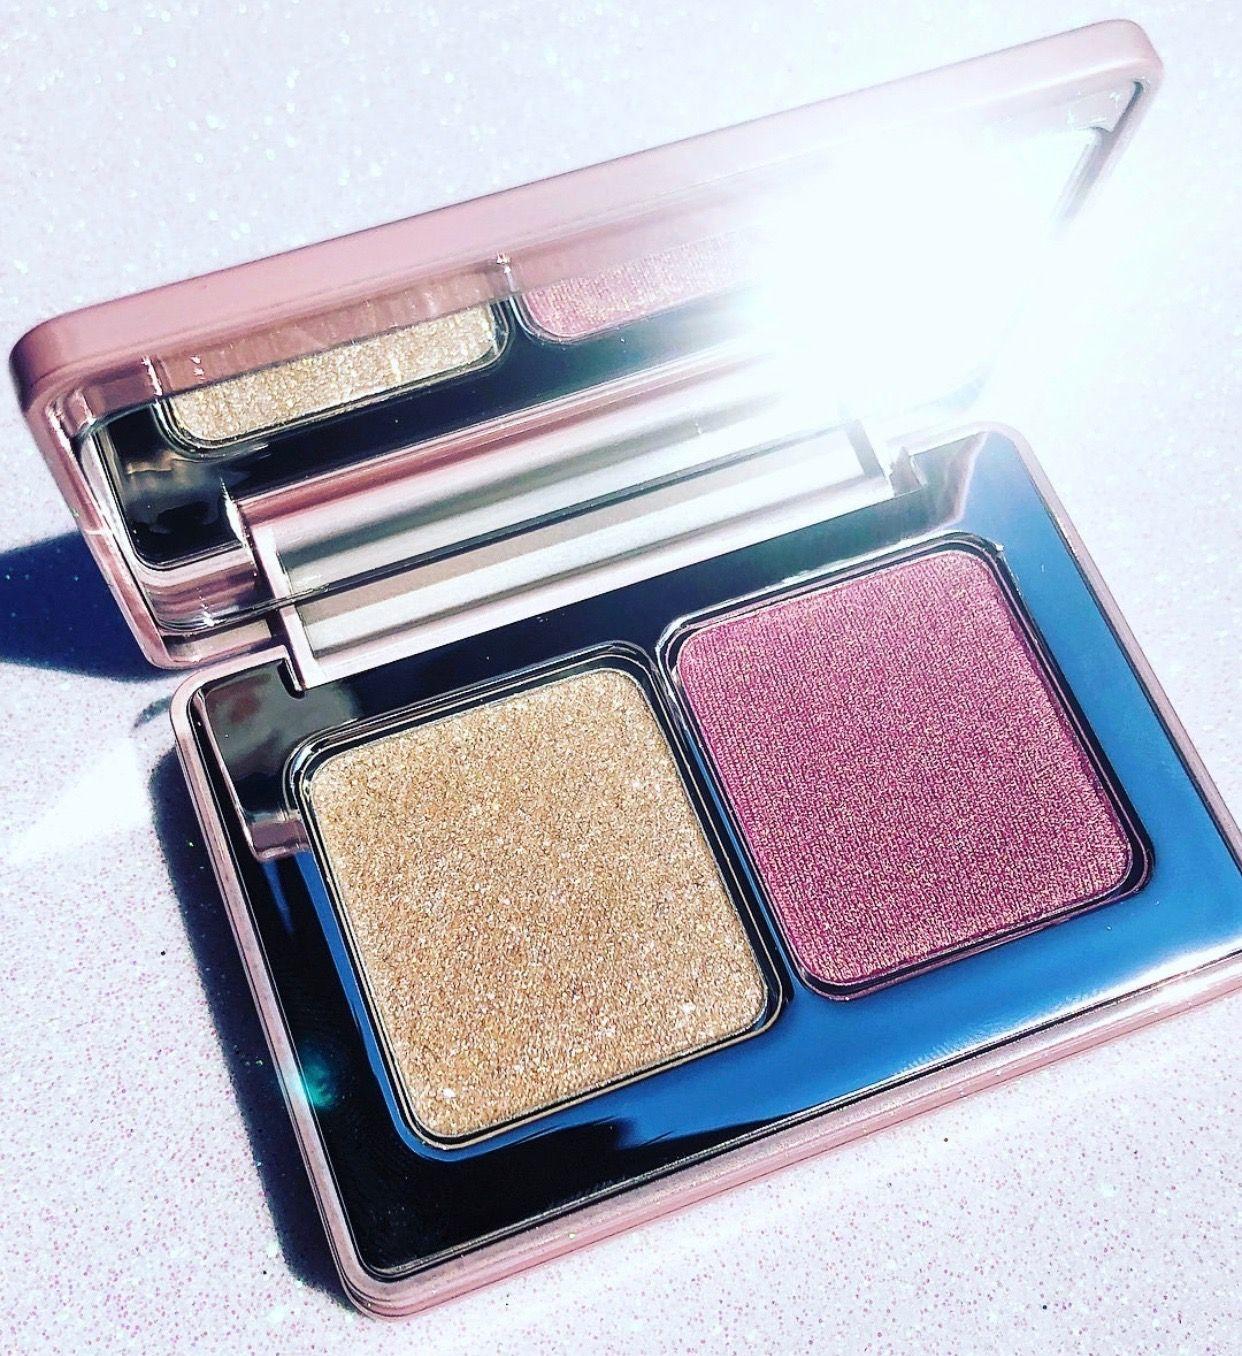 Natasha Denona Diamond & Glow blush & highlighting powder